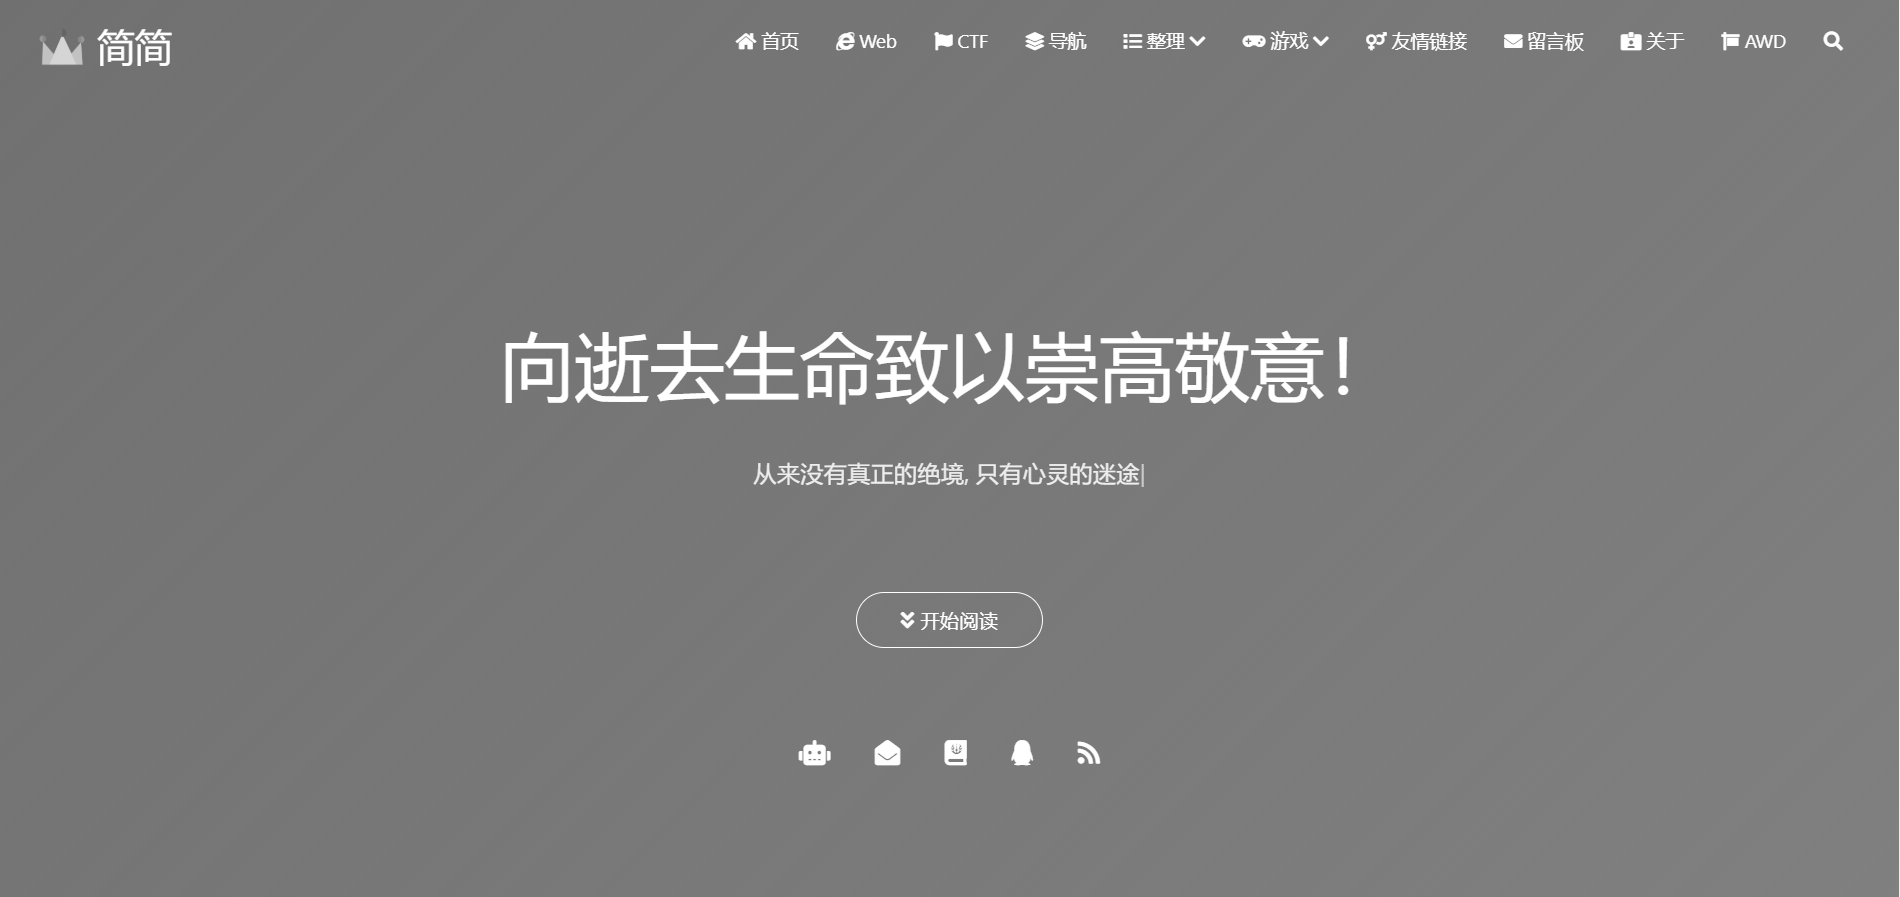 CSS filter-网页变灰